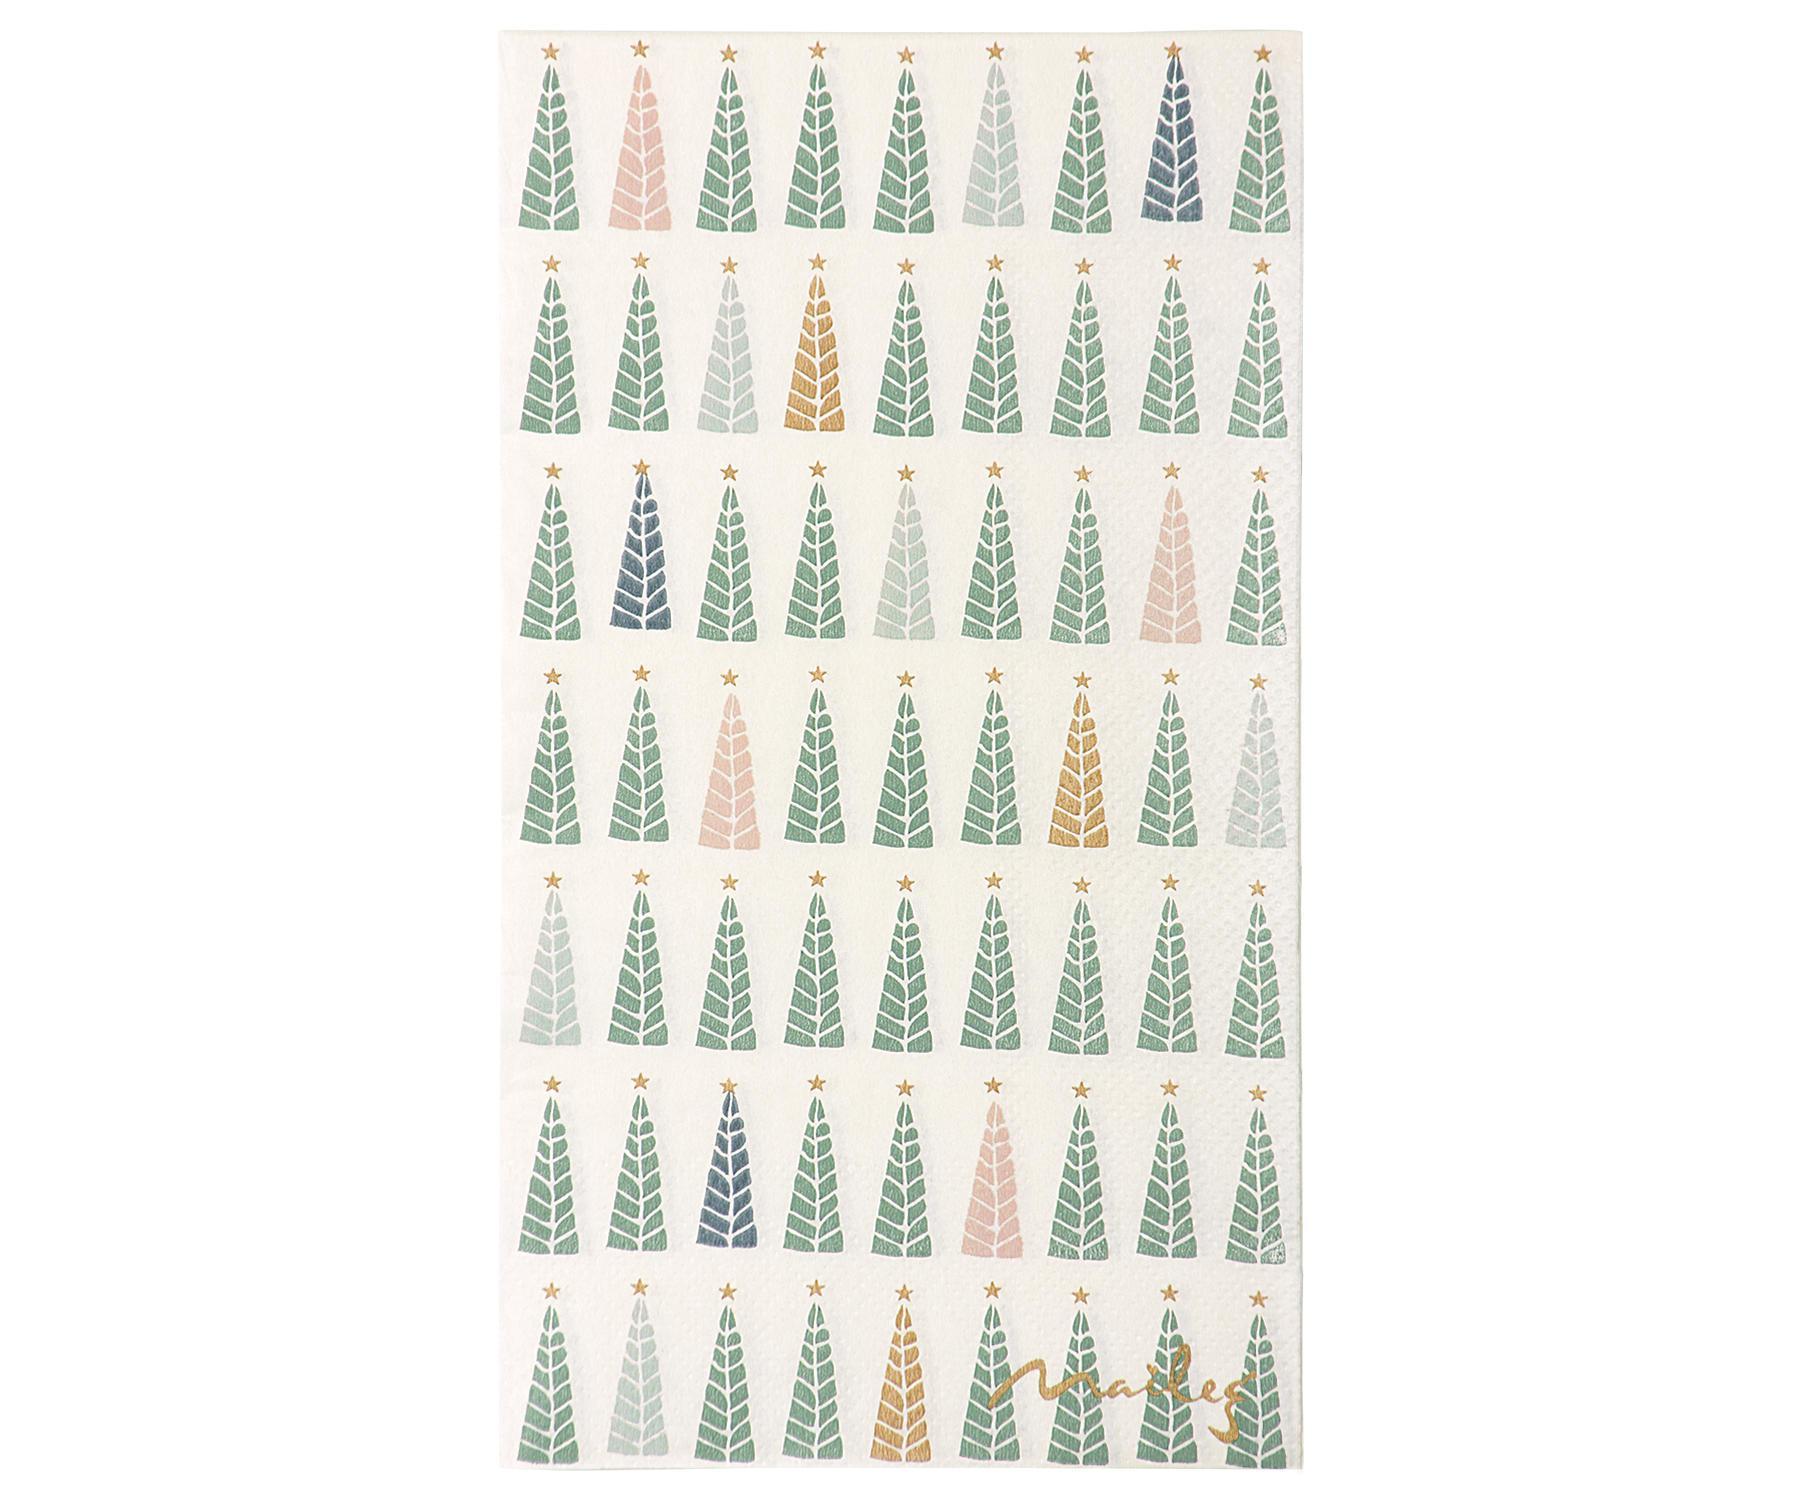 Maileg Papírové ubrousky Christmas trees, zelená barva, bílá barva, papír